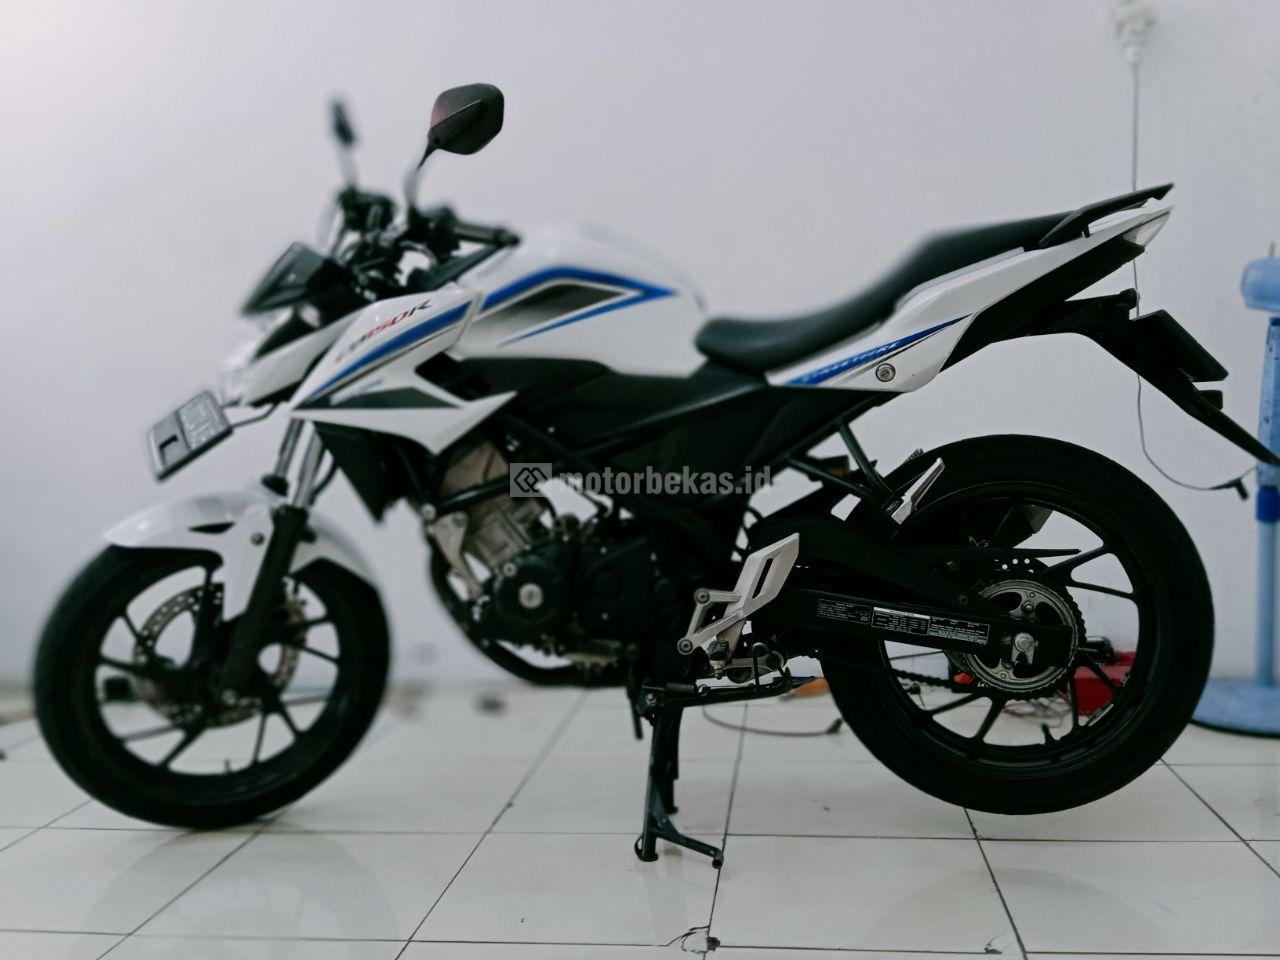 HONDA CB 150R FI 949 motorbekas.id